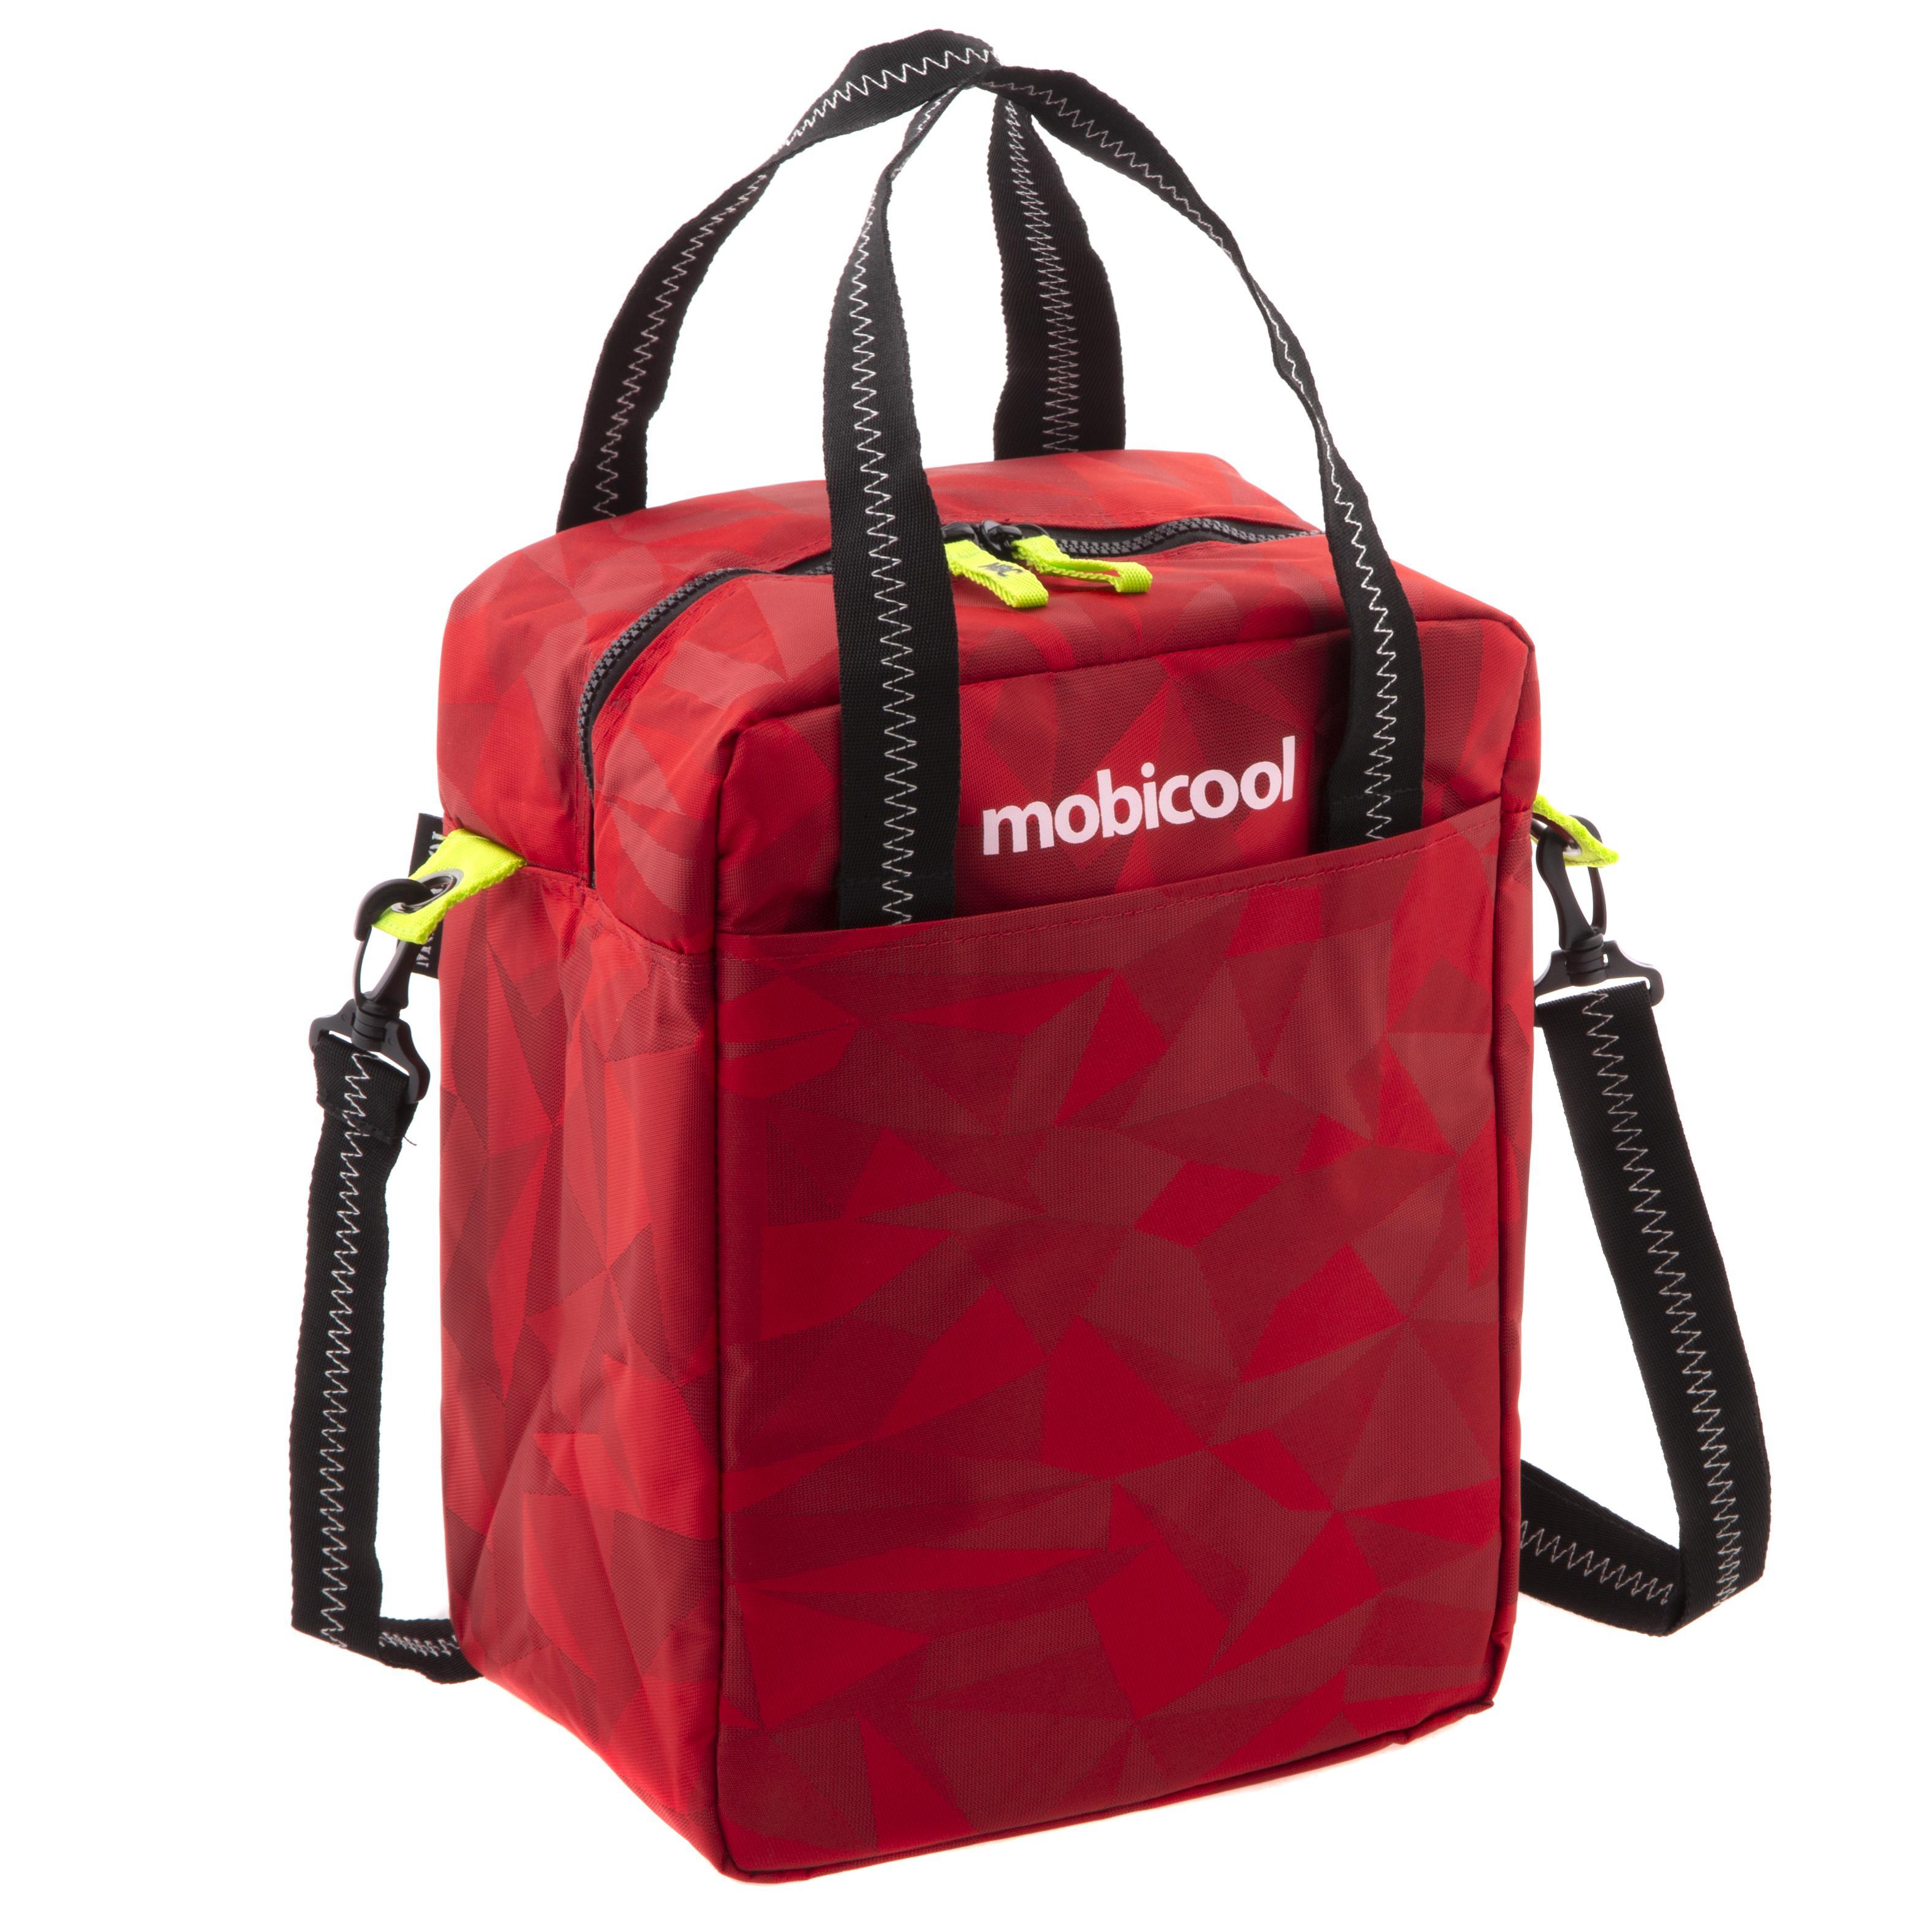 Купить Сумка-термос Mobicool Icon 16